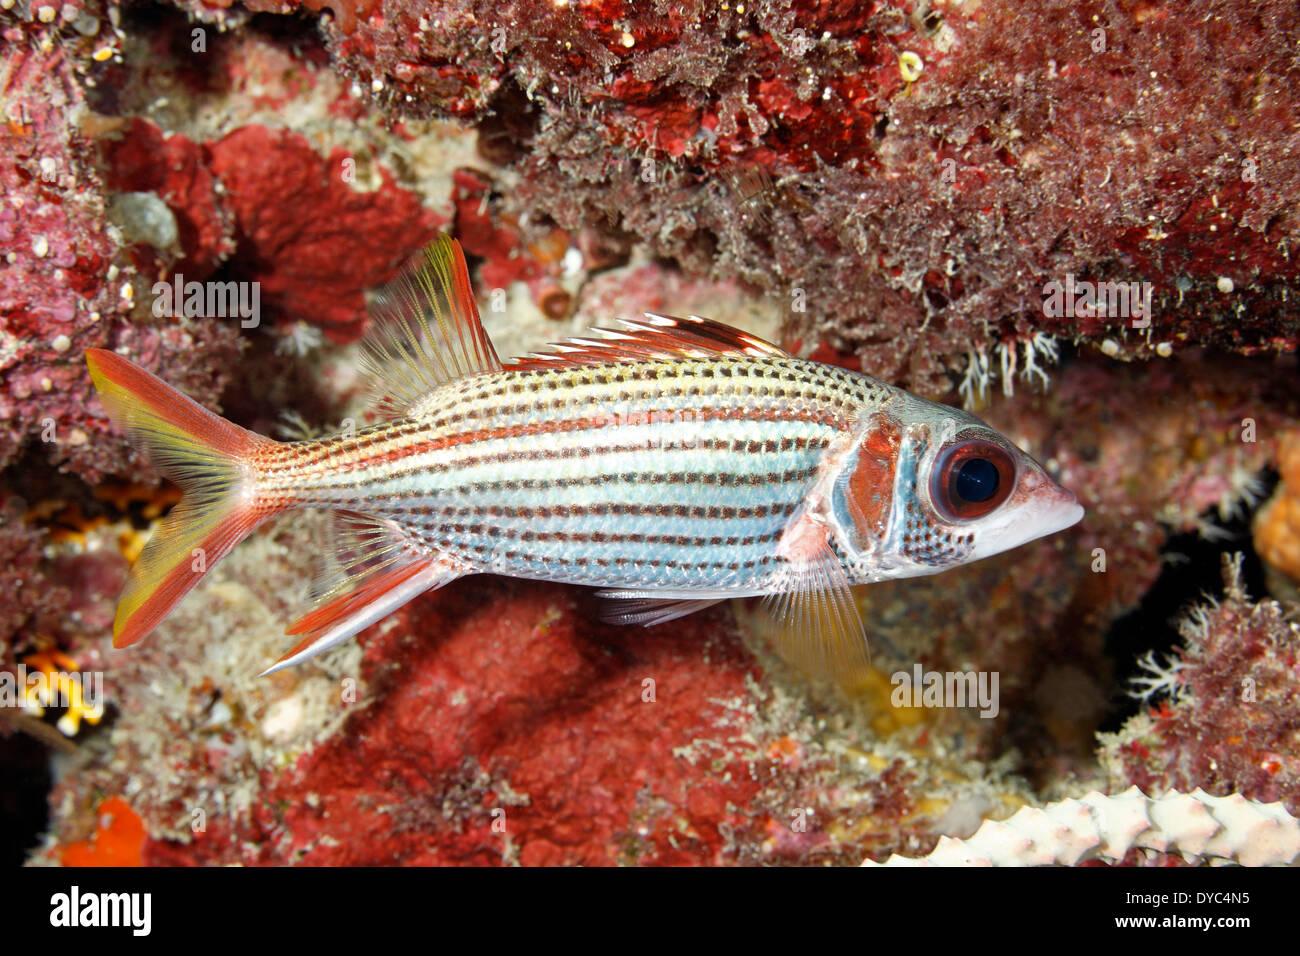 spotfin-squirrelfish-neoniphon-sammara-DYC4N5.jpg